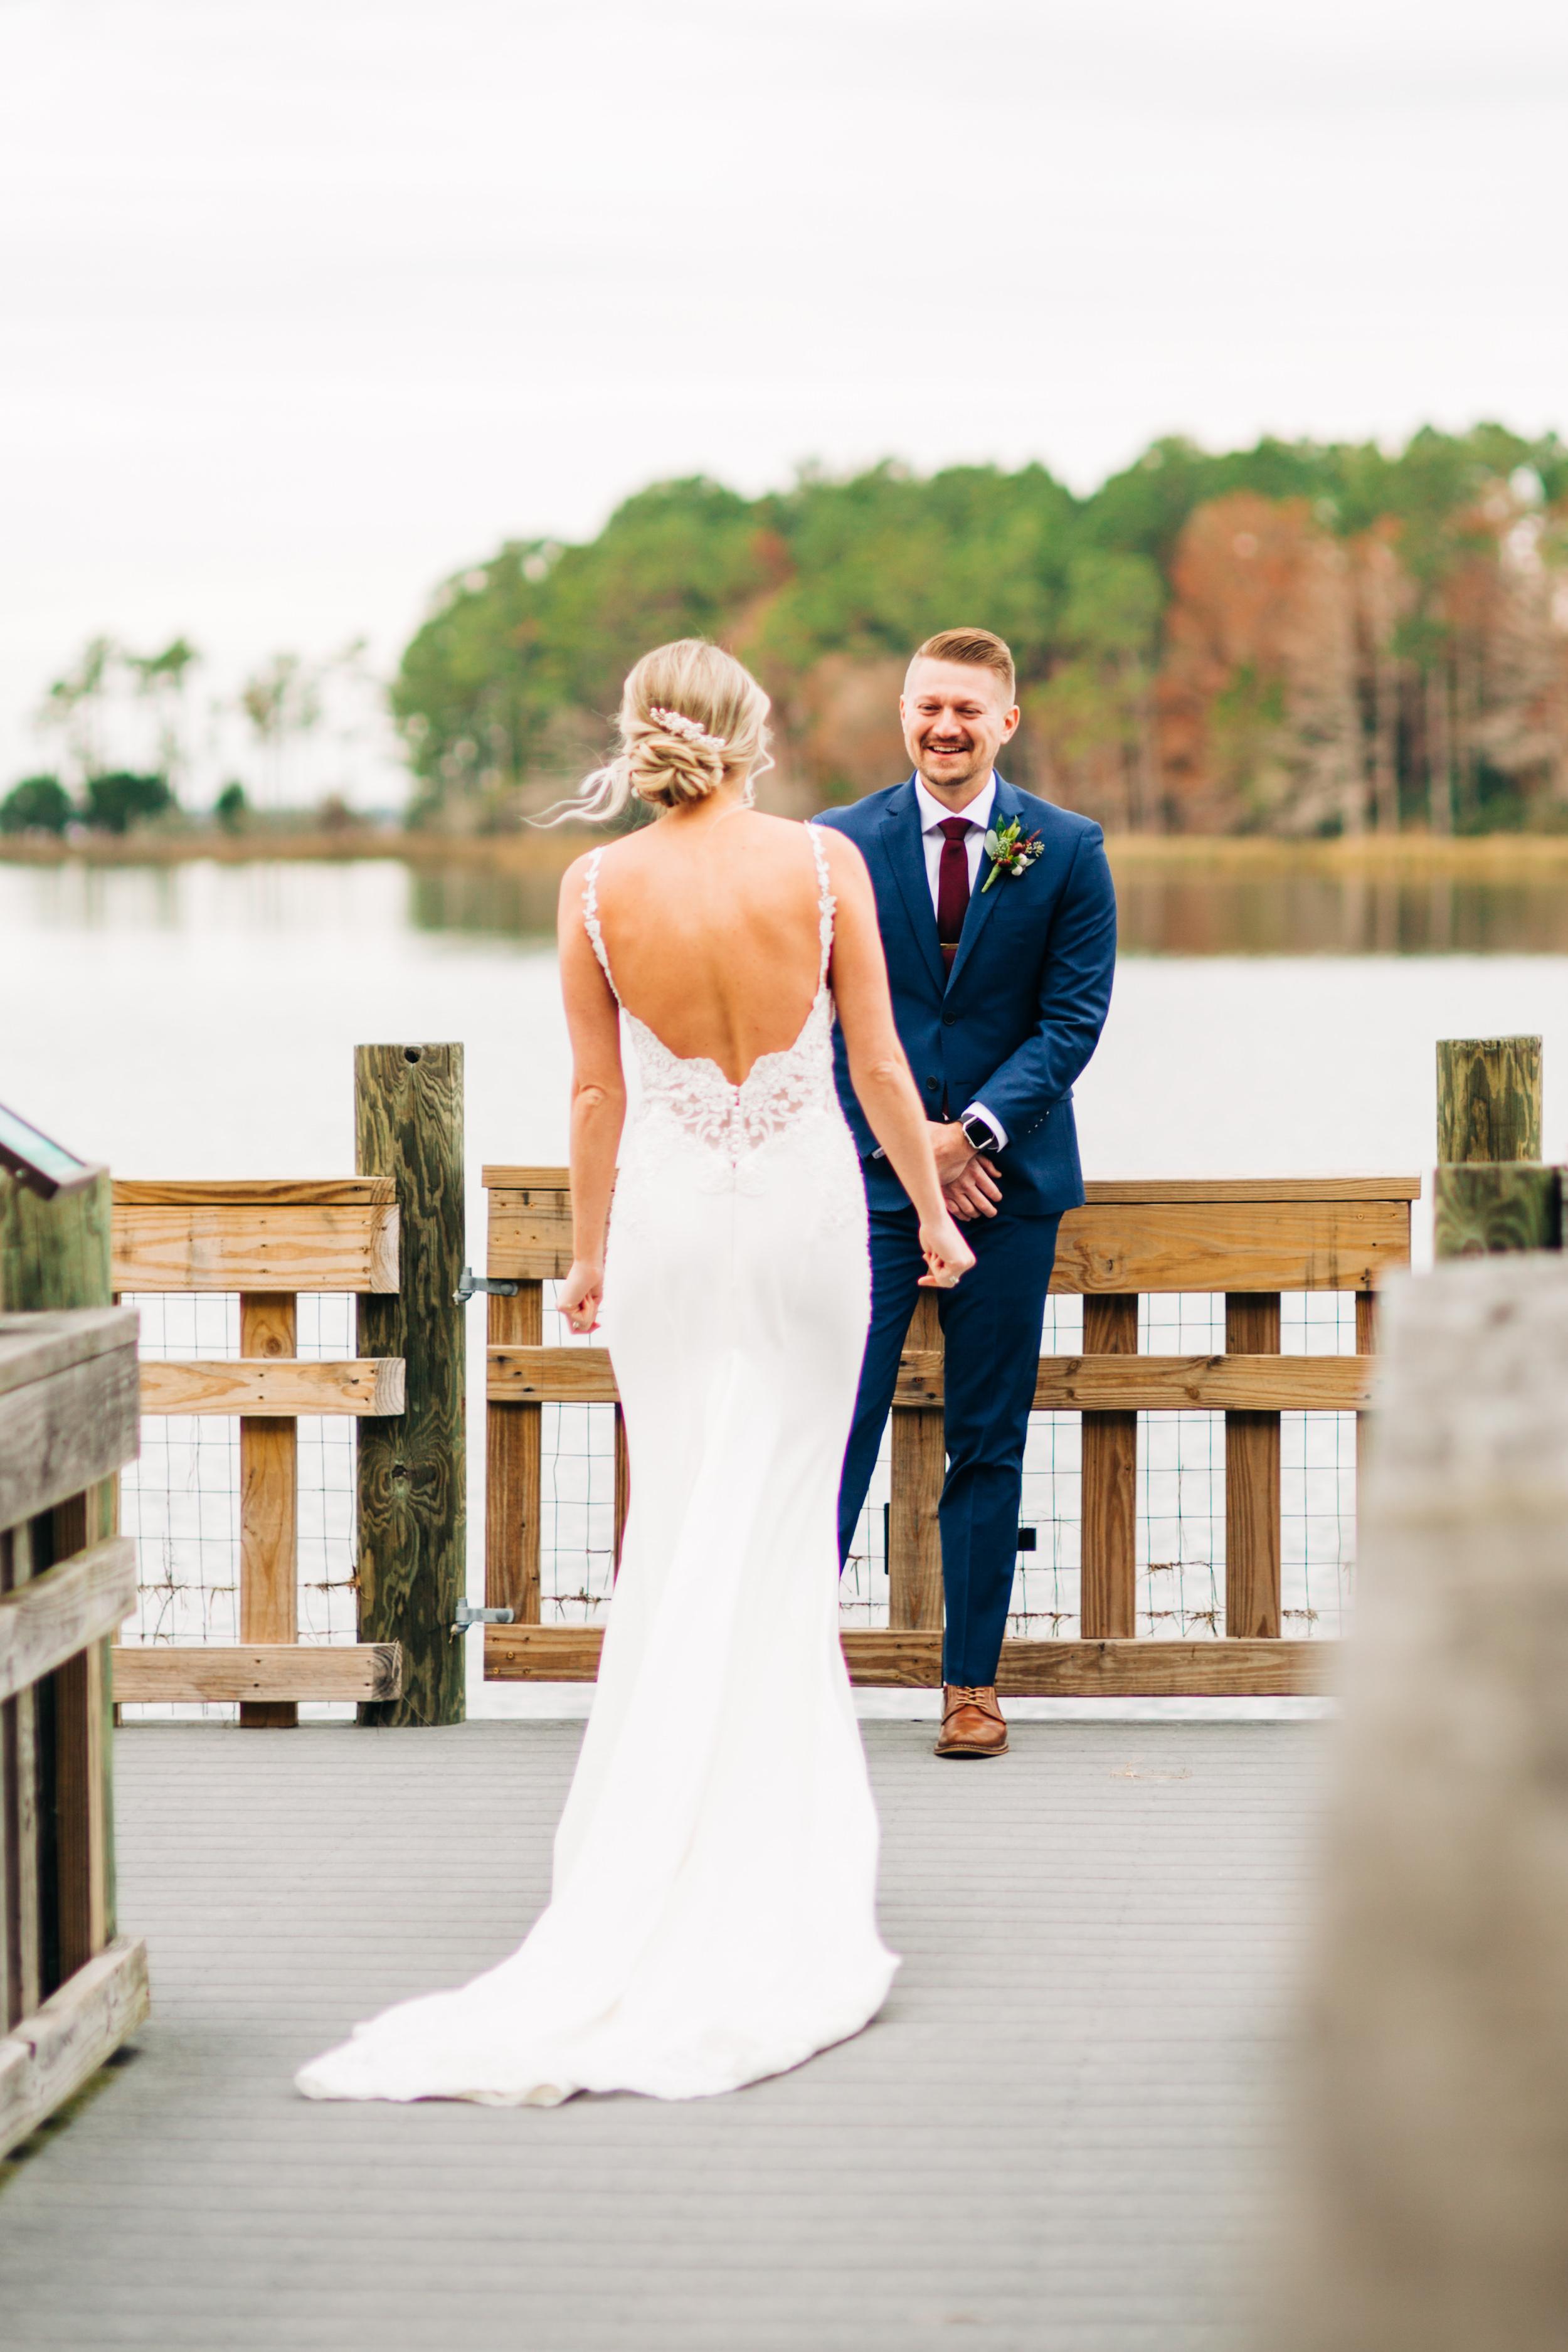 Ricky & Brittney - Pre Ceremony - Jake & Katie Photography_325.jpg